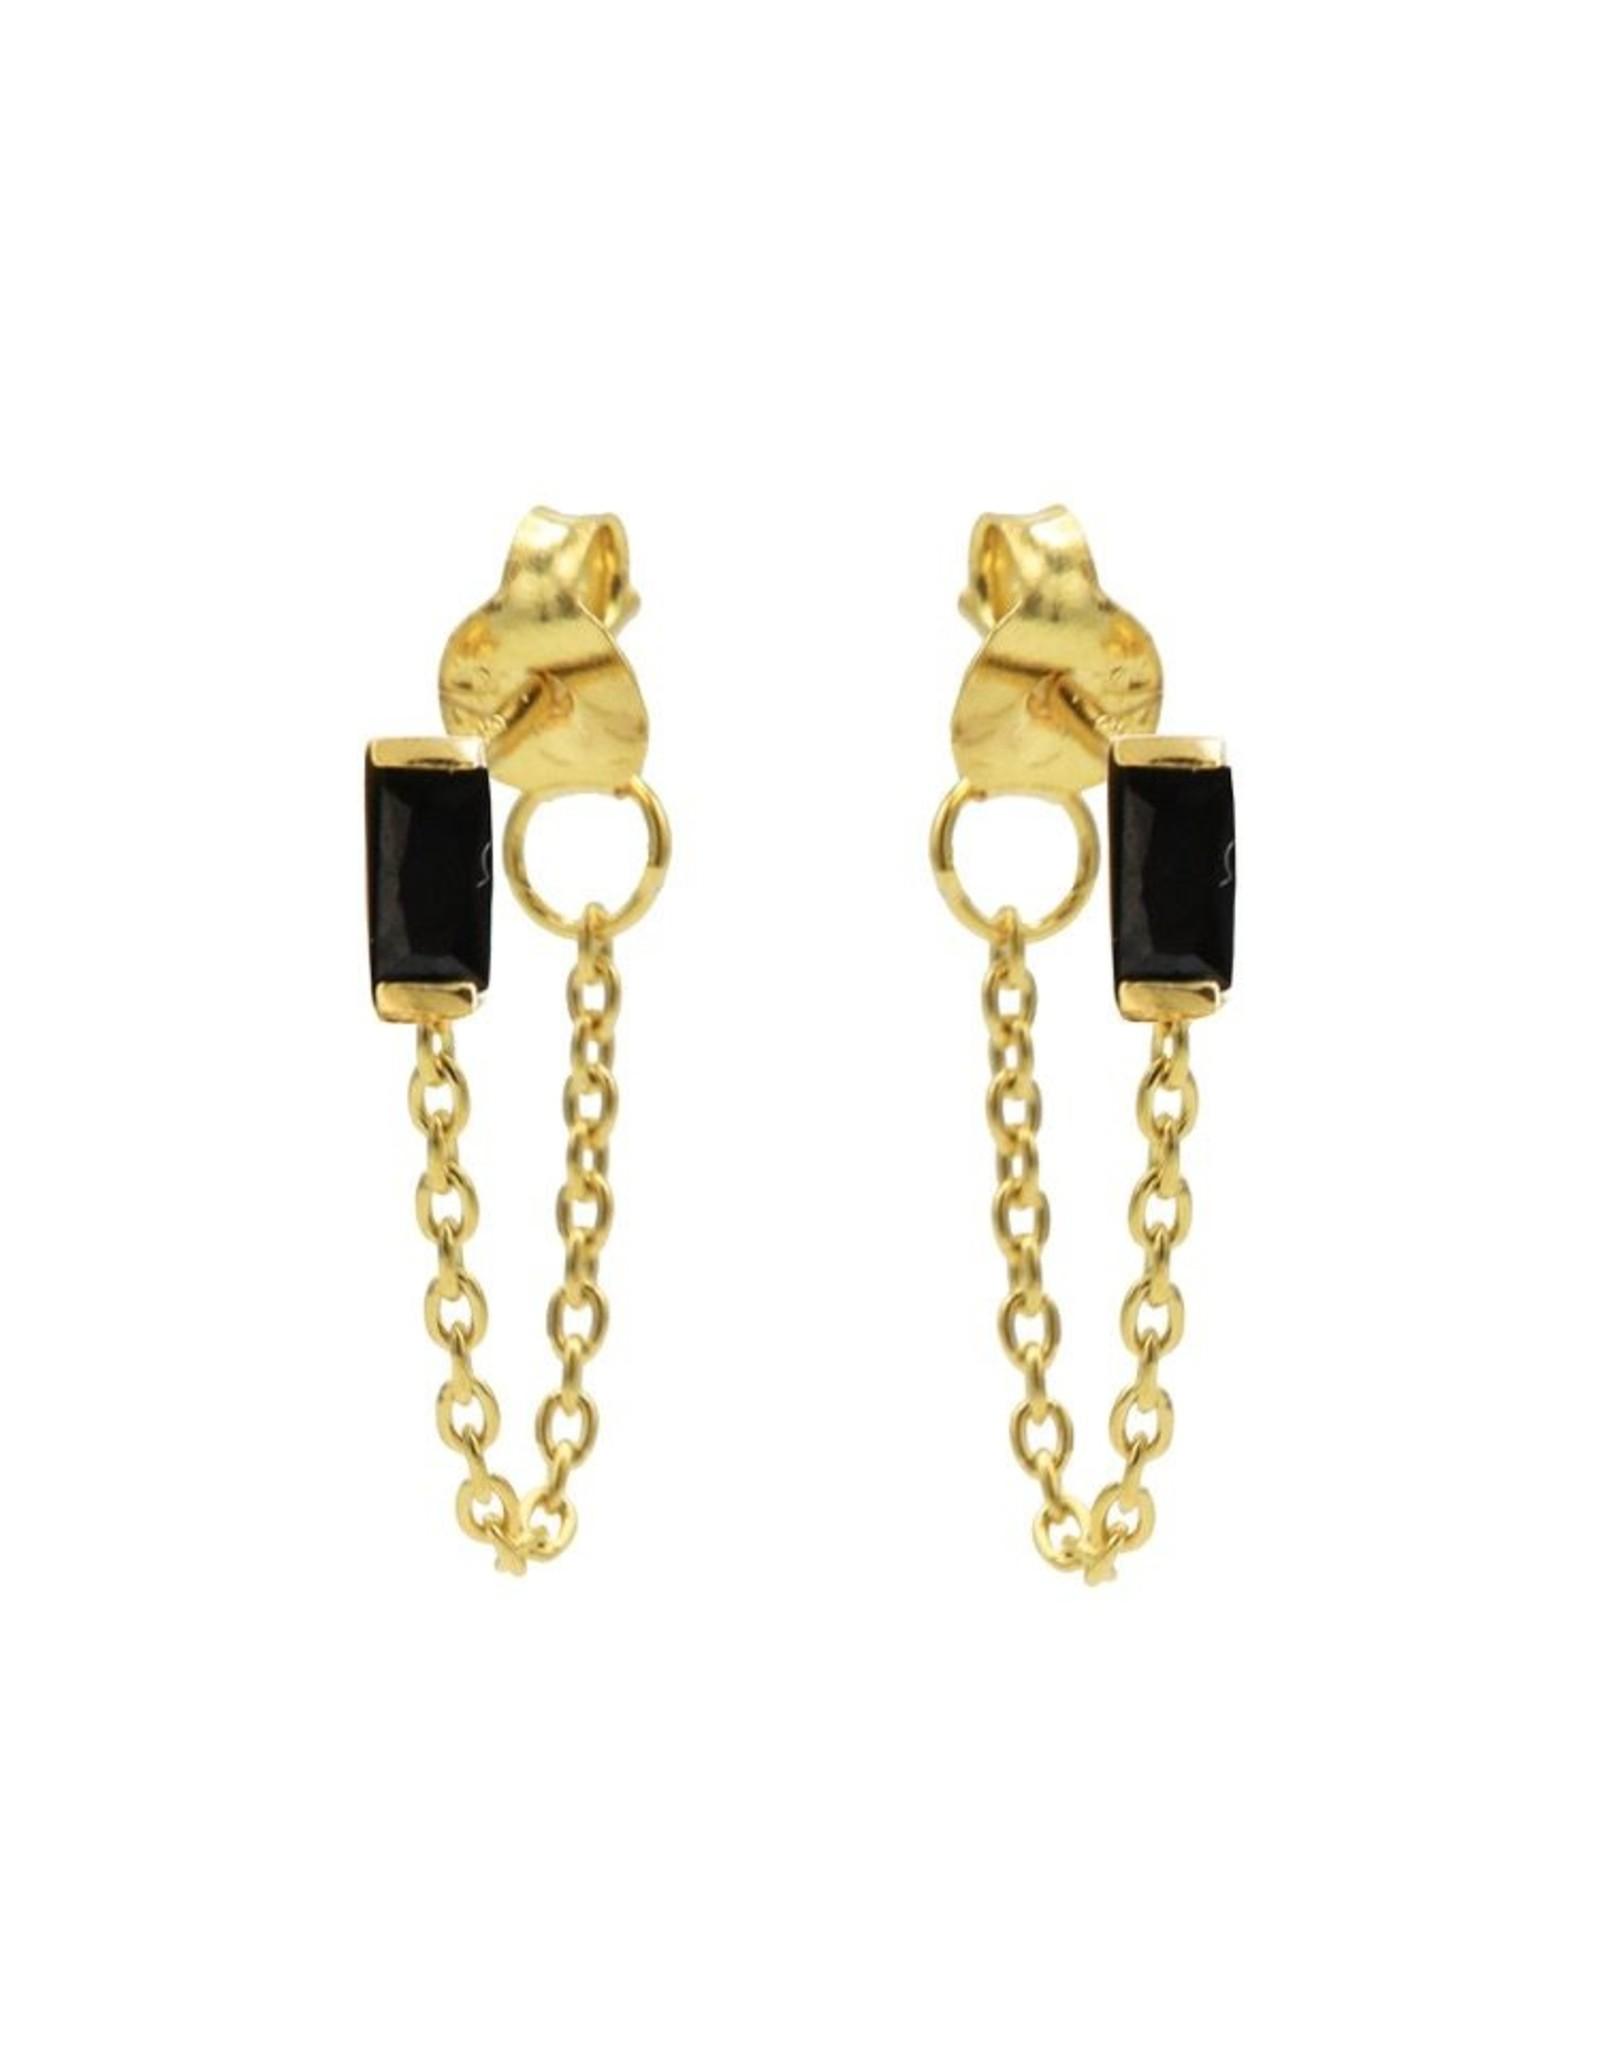 Karma Chain Black Zirconia Single Square Goldplated Set